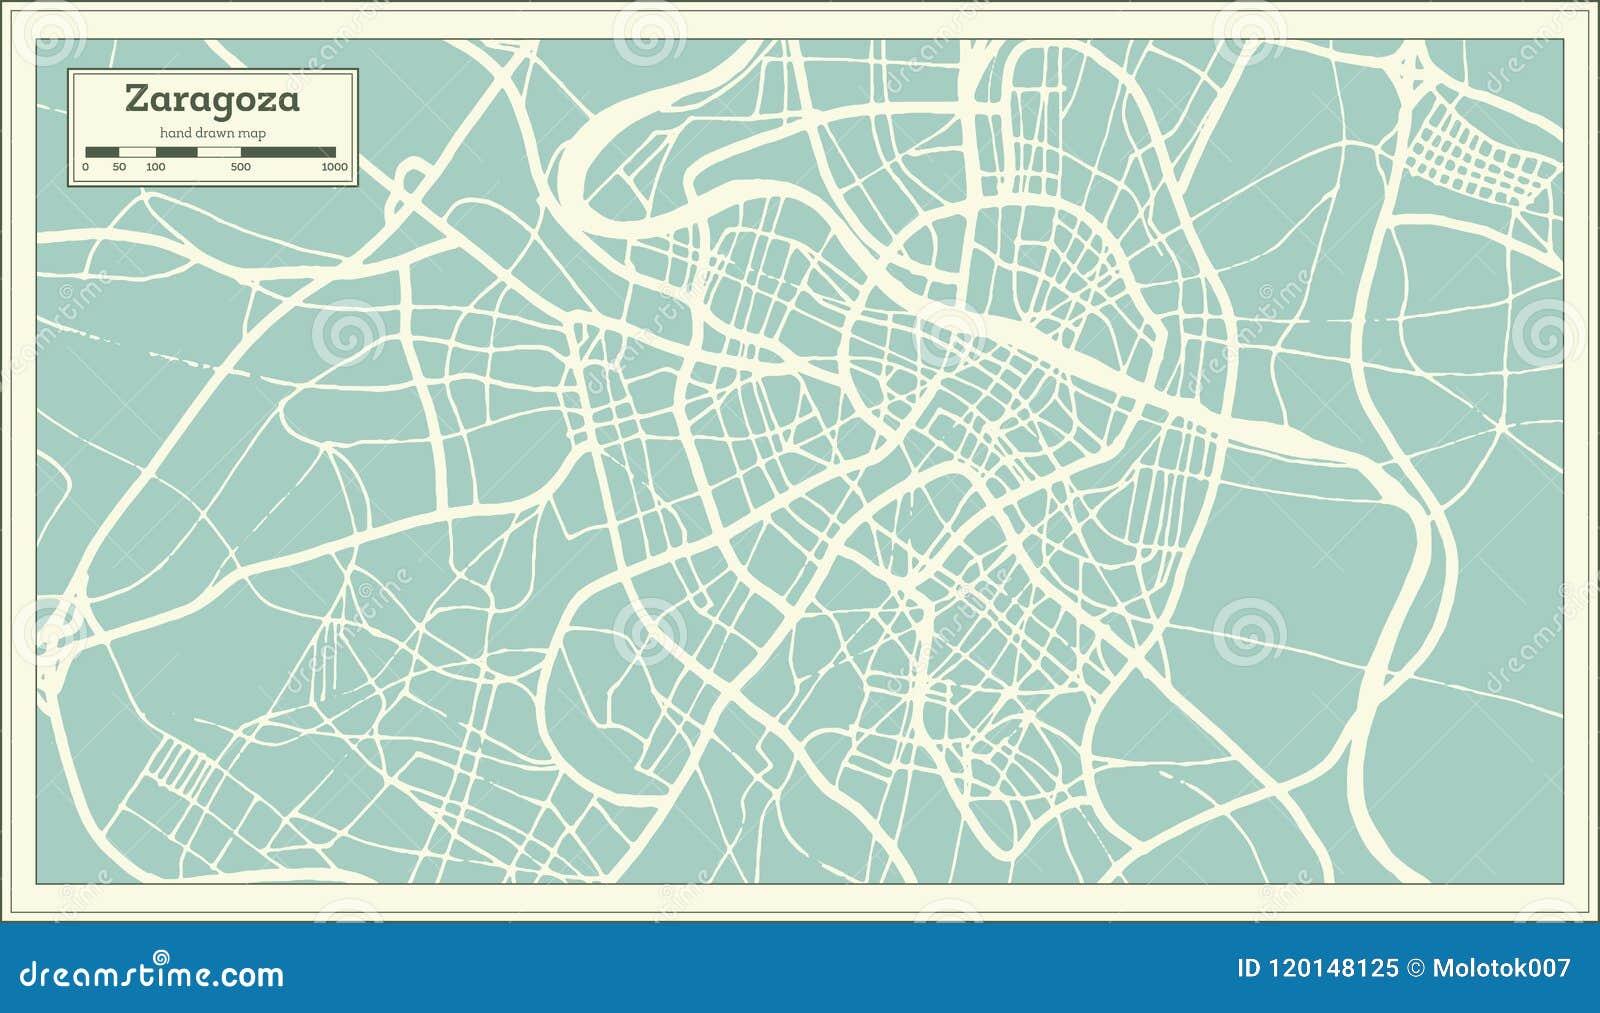 tarraco spain map, barcelona spain map, tarragona spain map, aragon spain map, paris spain map, rio ebro spain map, alquezar spain map, jerez de la frontera spain map, marbella malaga spain map, madrid spain map, andujar spain map, mieres spain map, ponferrada spain map, southern spain map, sagunto spain map, huesca spain map, zarautz spain map, teguise spain map, bilbao spain map, zamora spain map, on zaragoza spain map